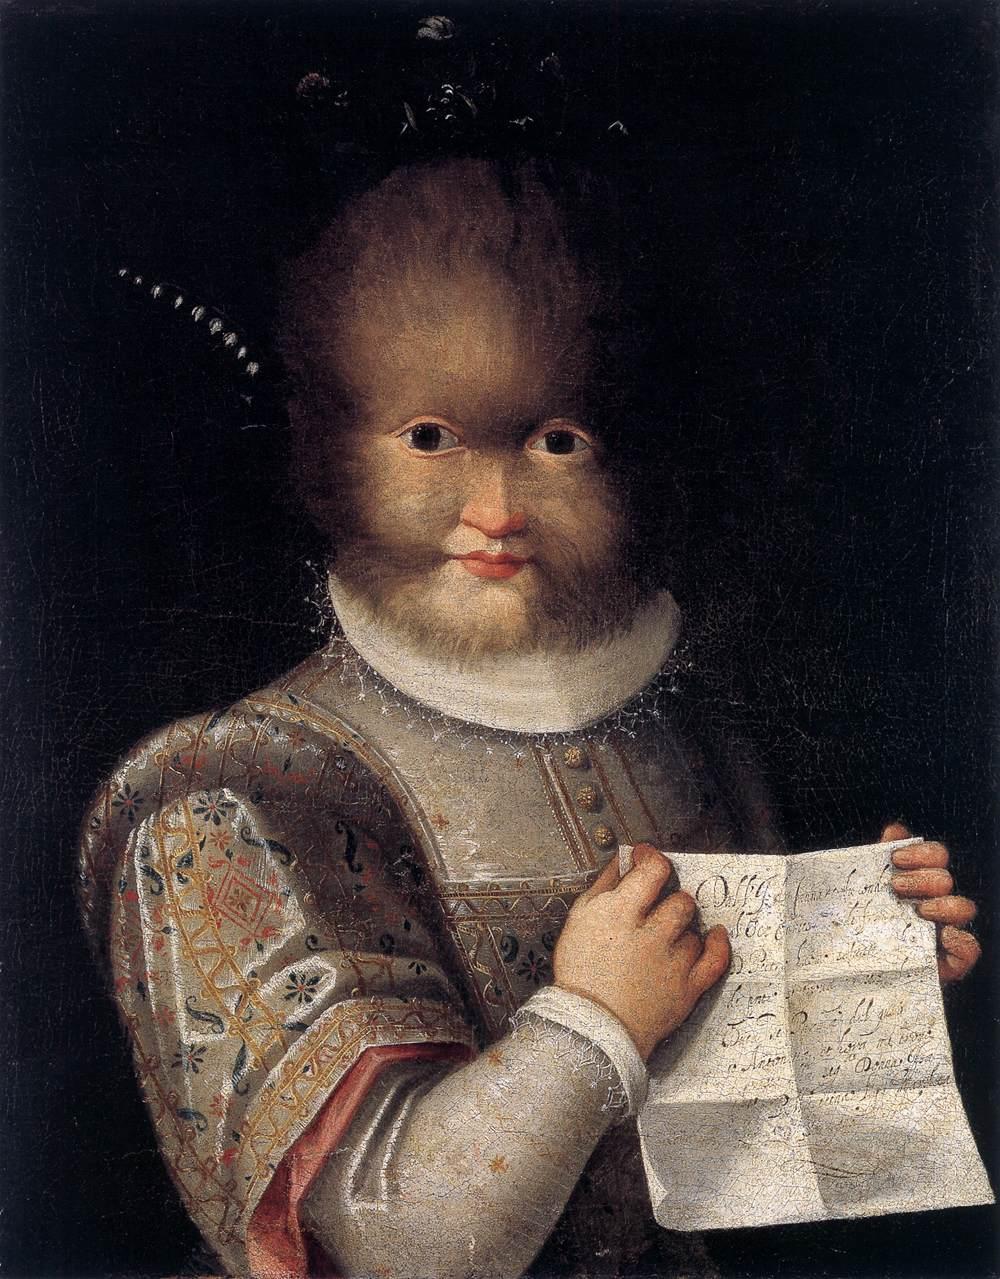 Best Baroque Painting - Lavinia Fontana's portrait of Antonietta Gonzalez